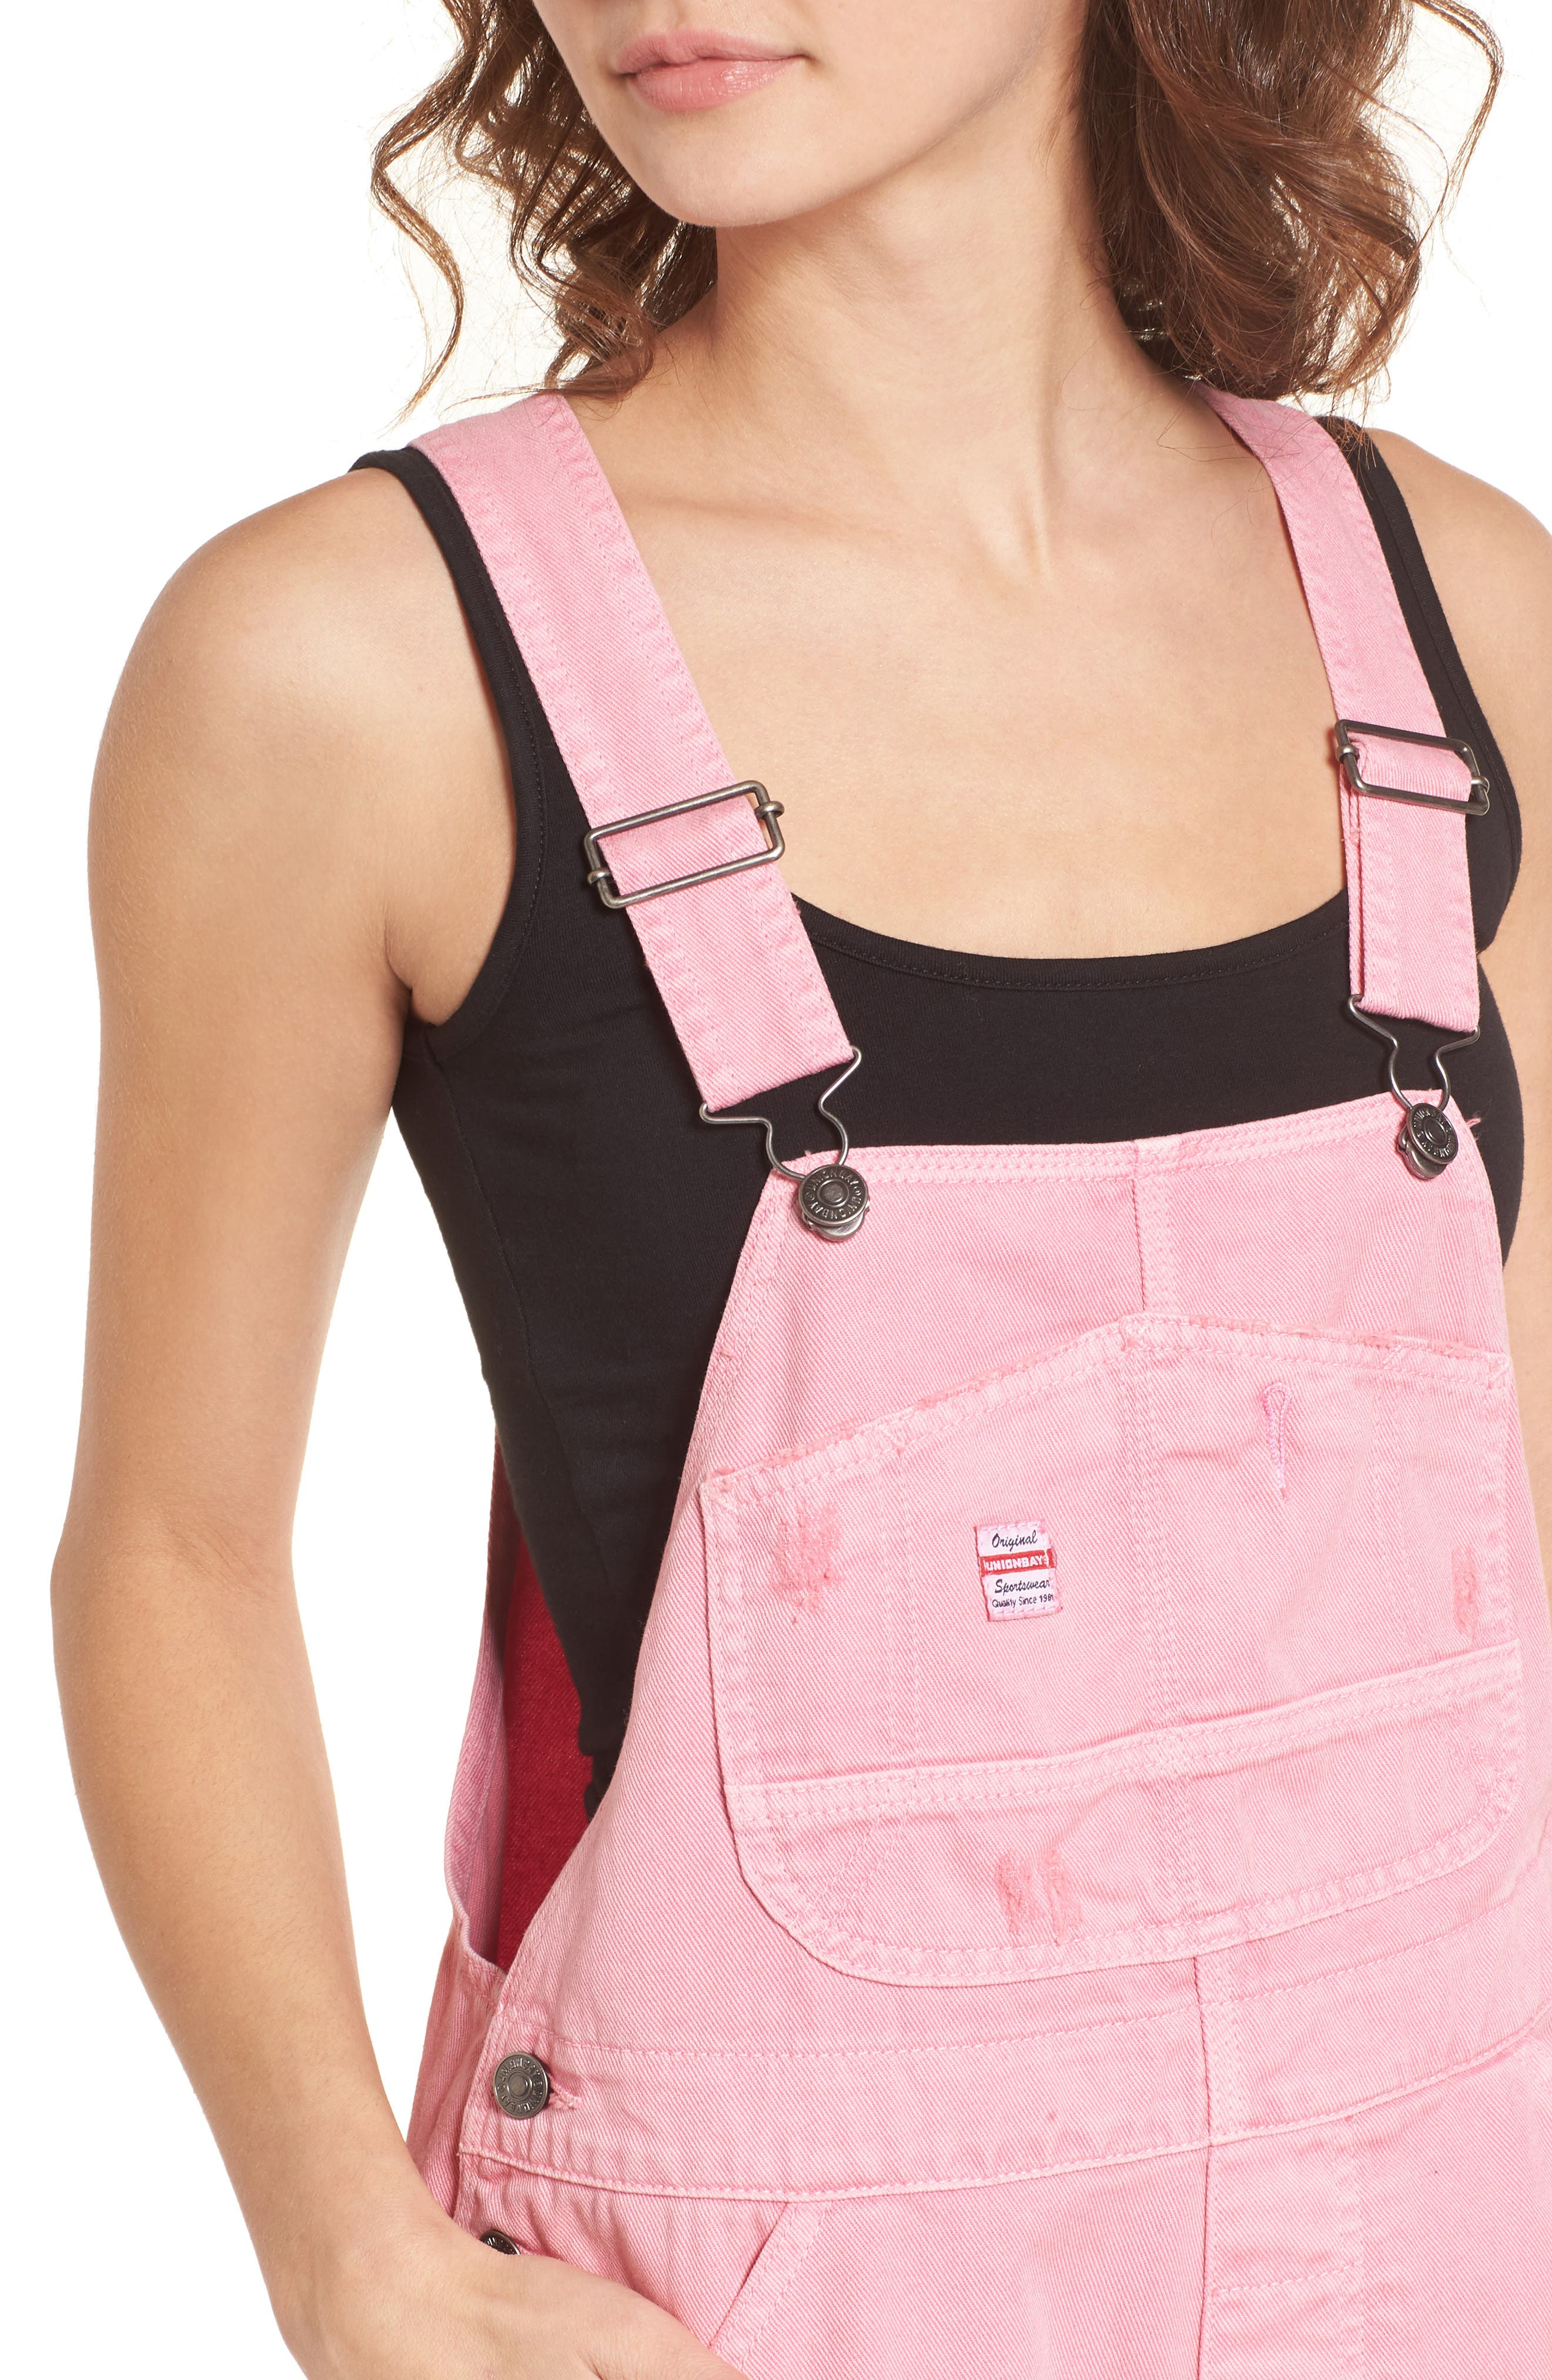 Unionbay Mario Denim Shortalls,                             Alternate thumbnail 4, color,                             Popsicle Pink